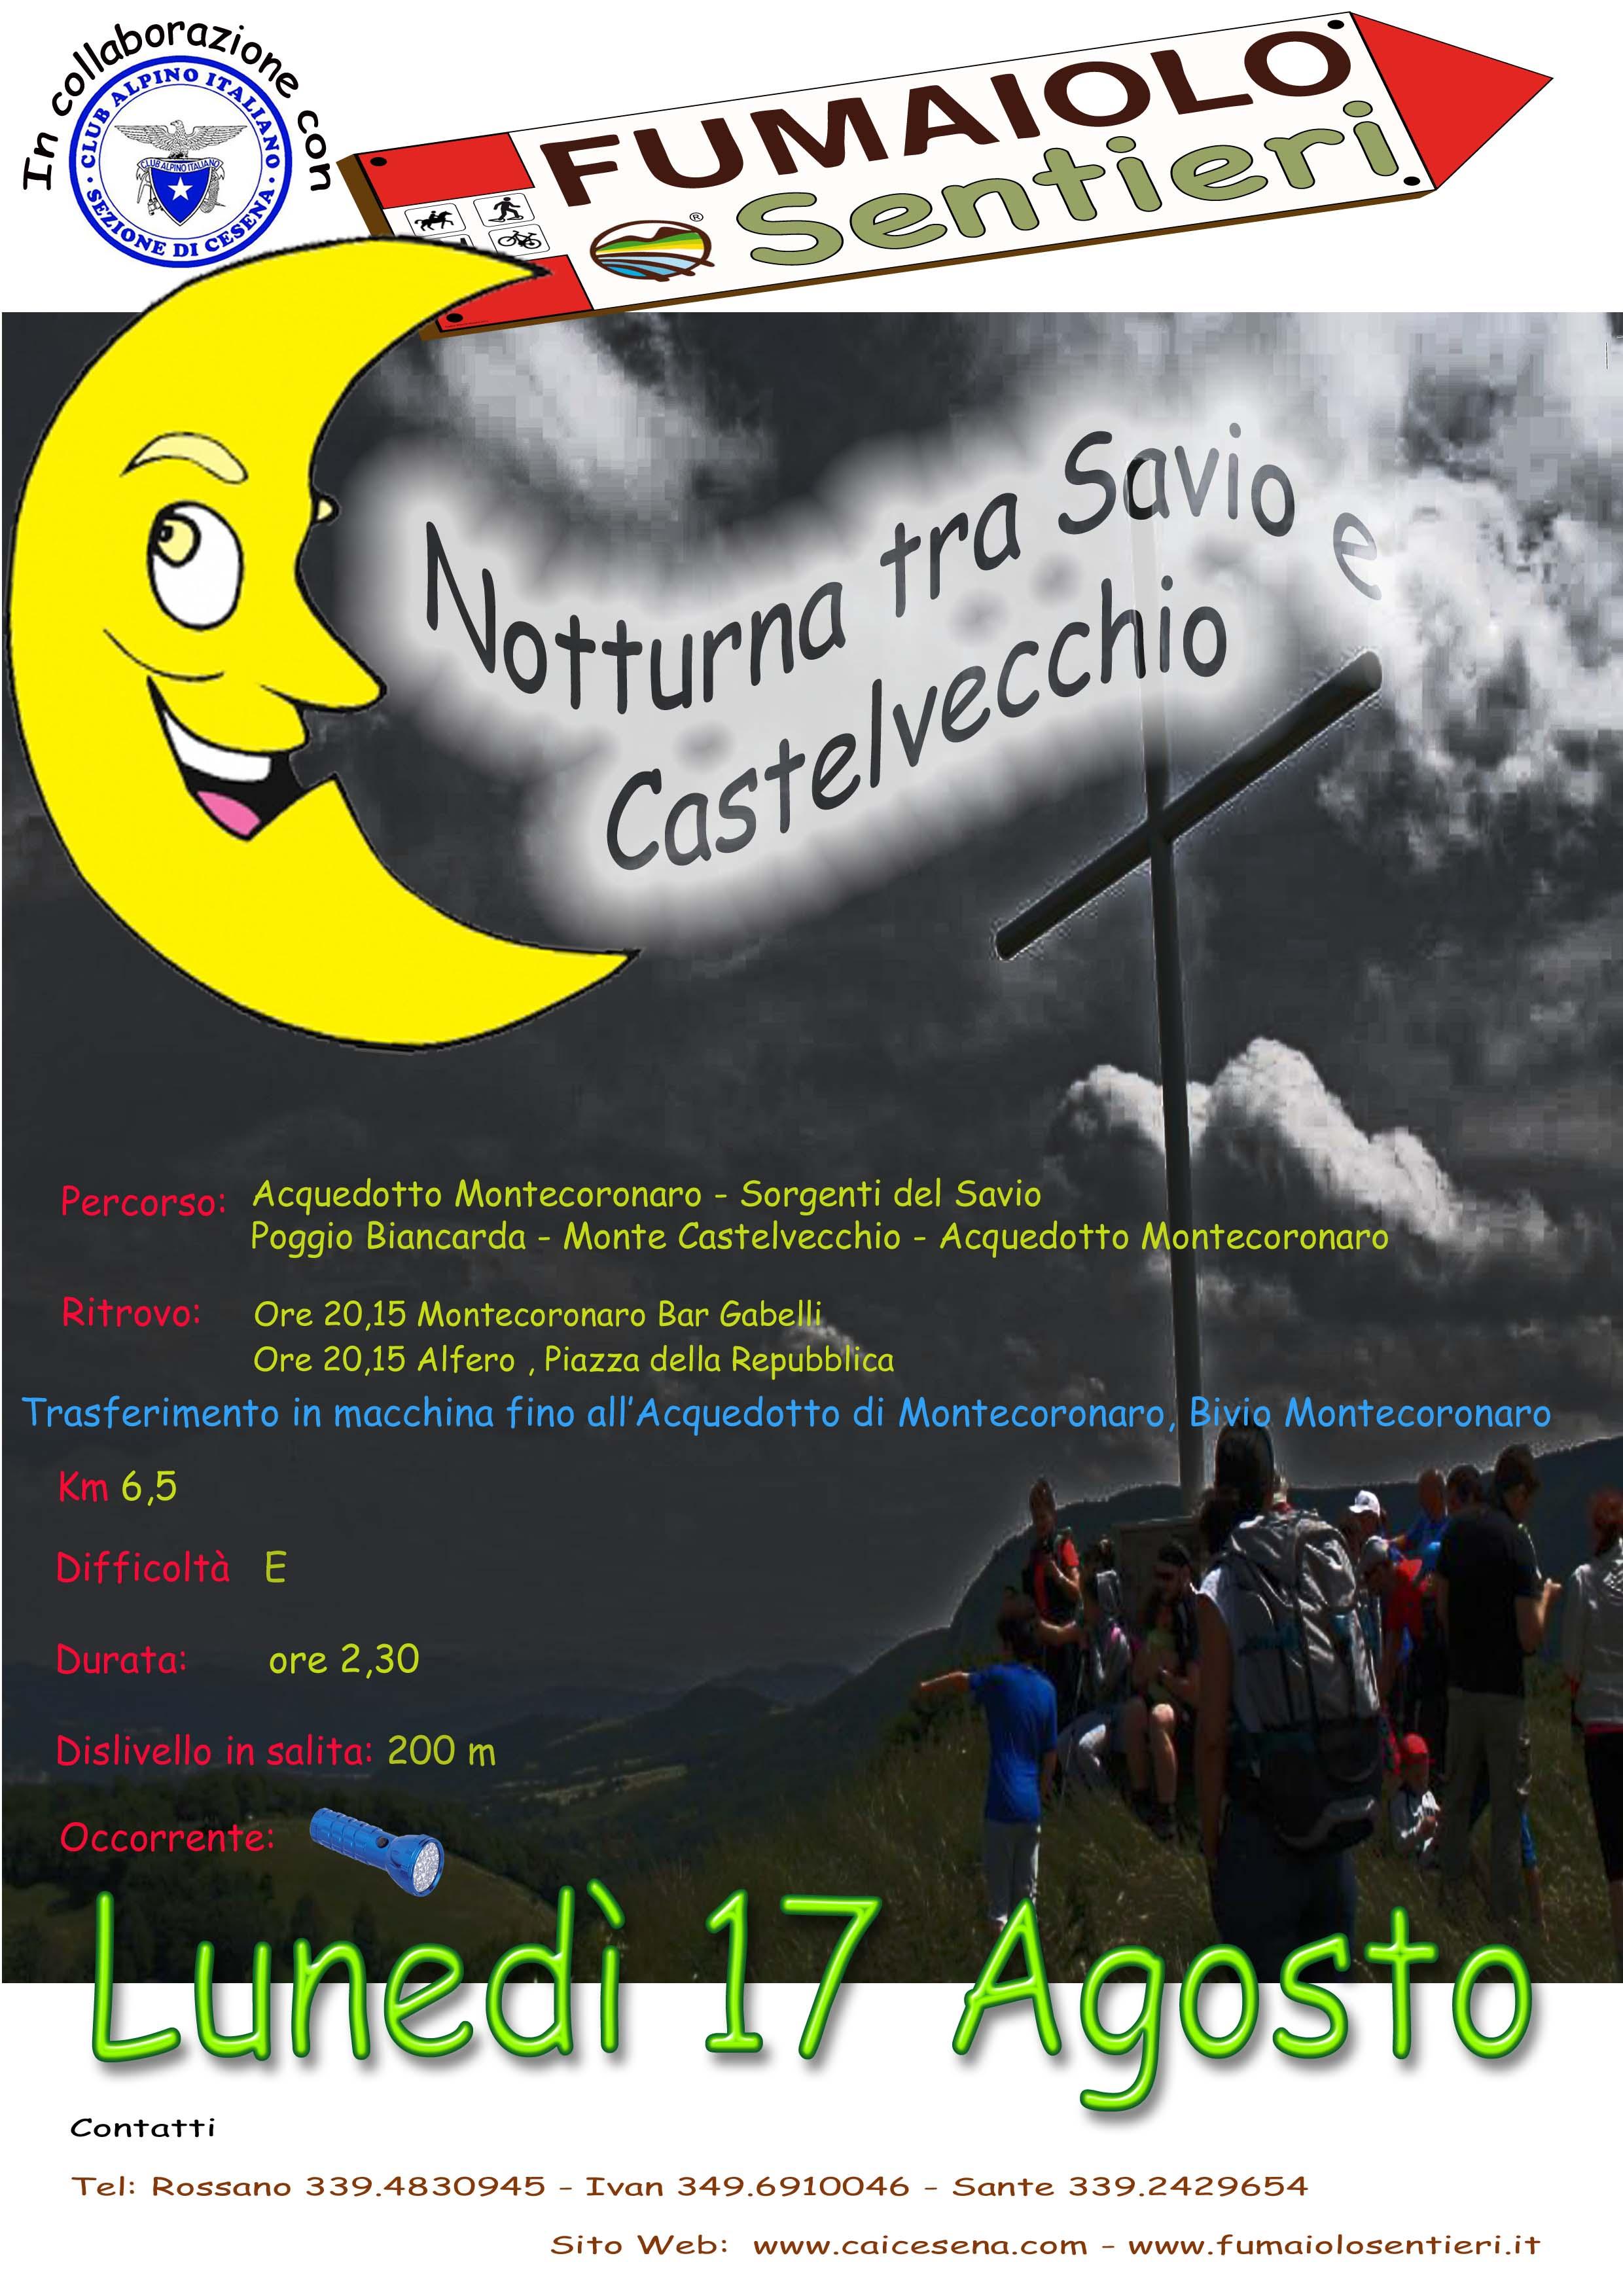 Notturna tra Savio e Castelvecchio